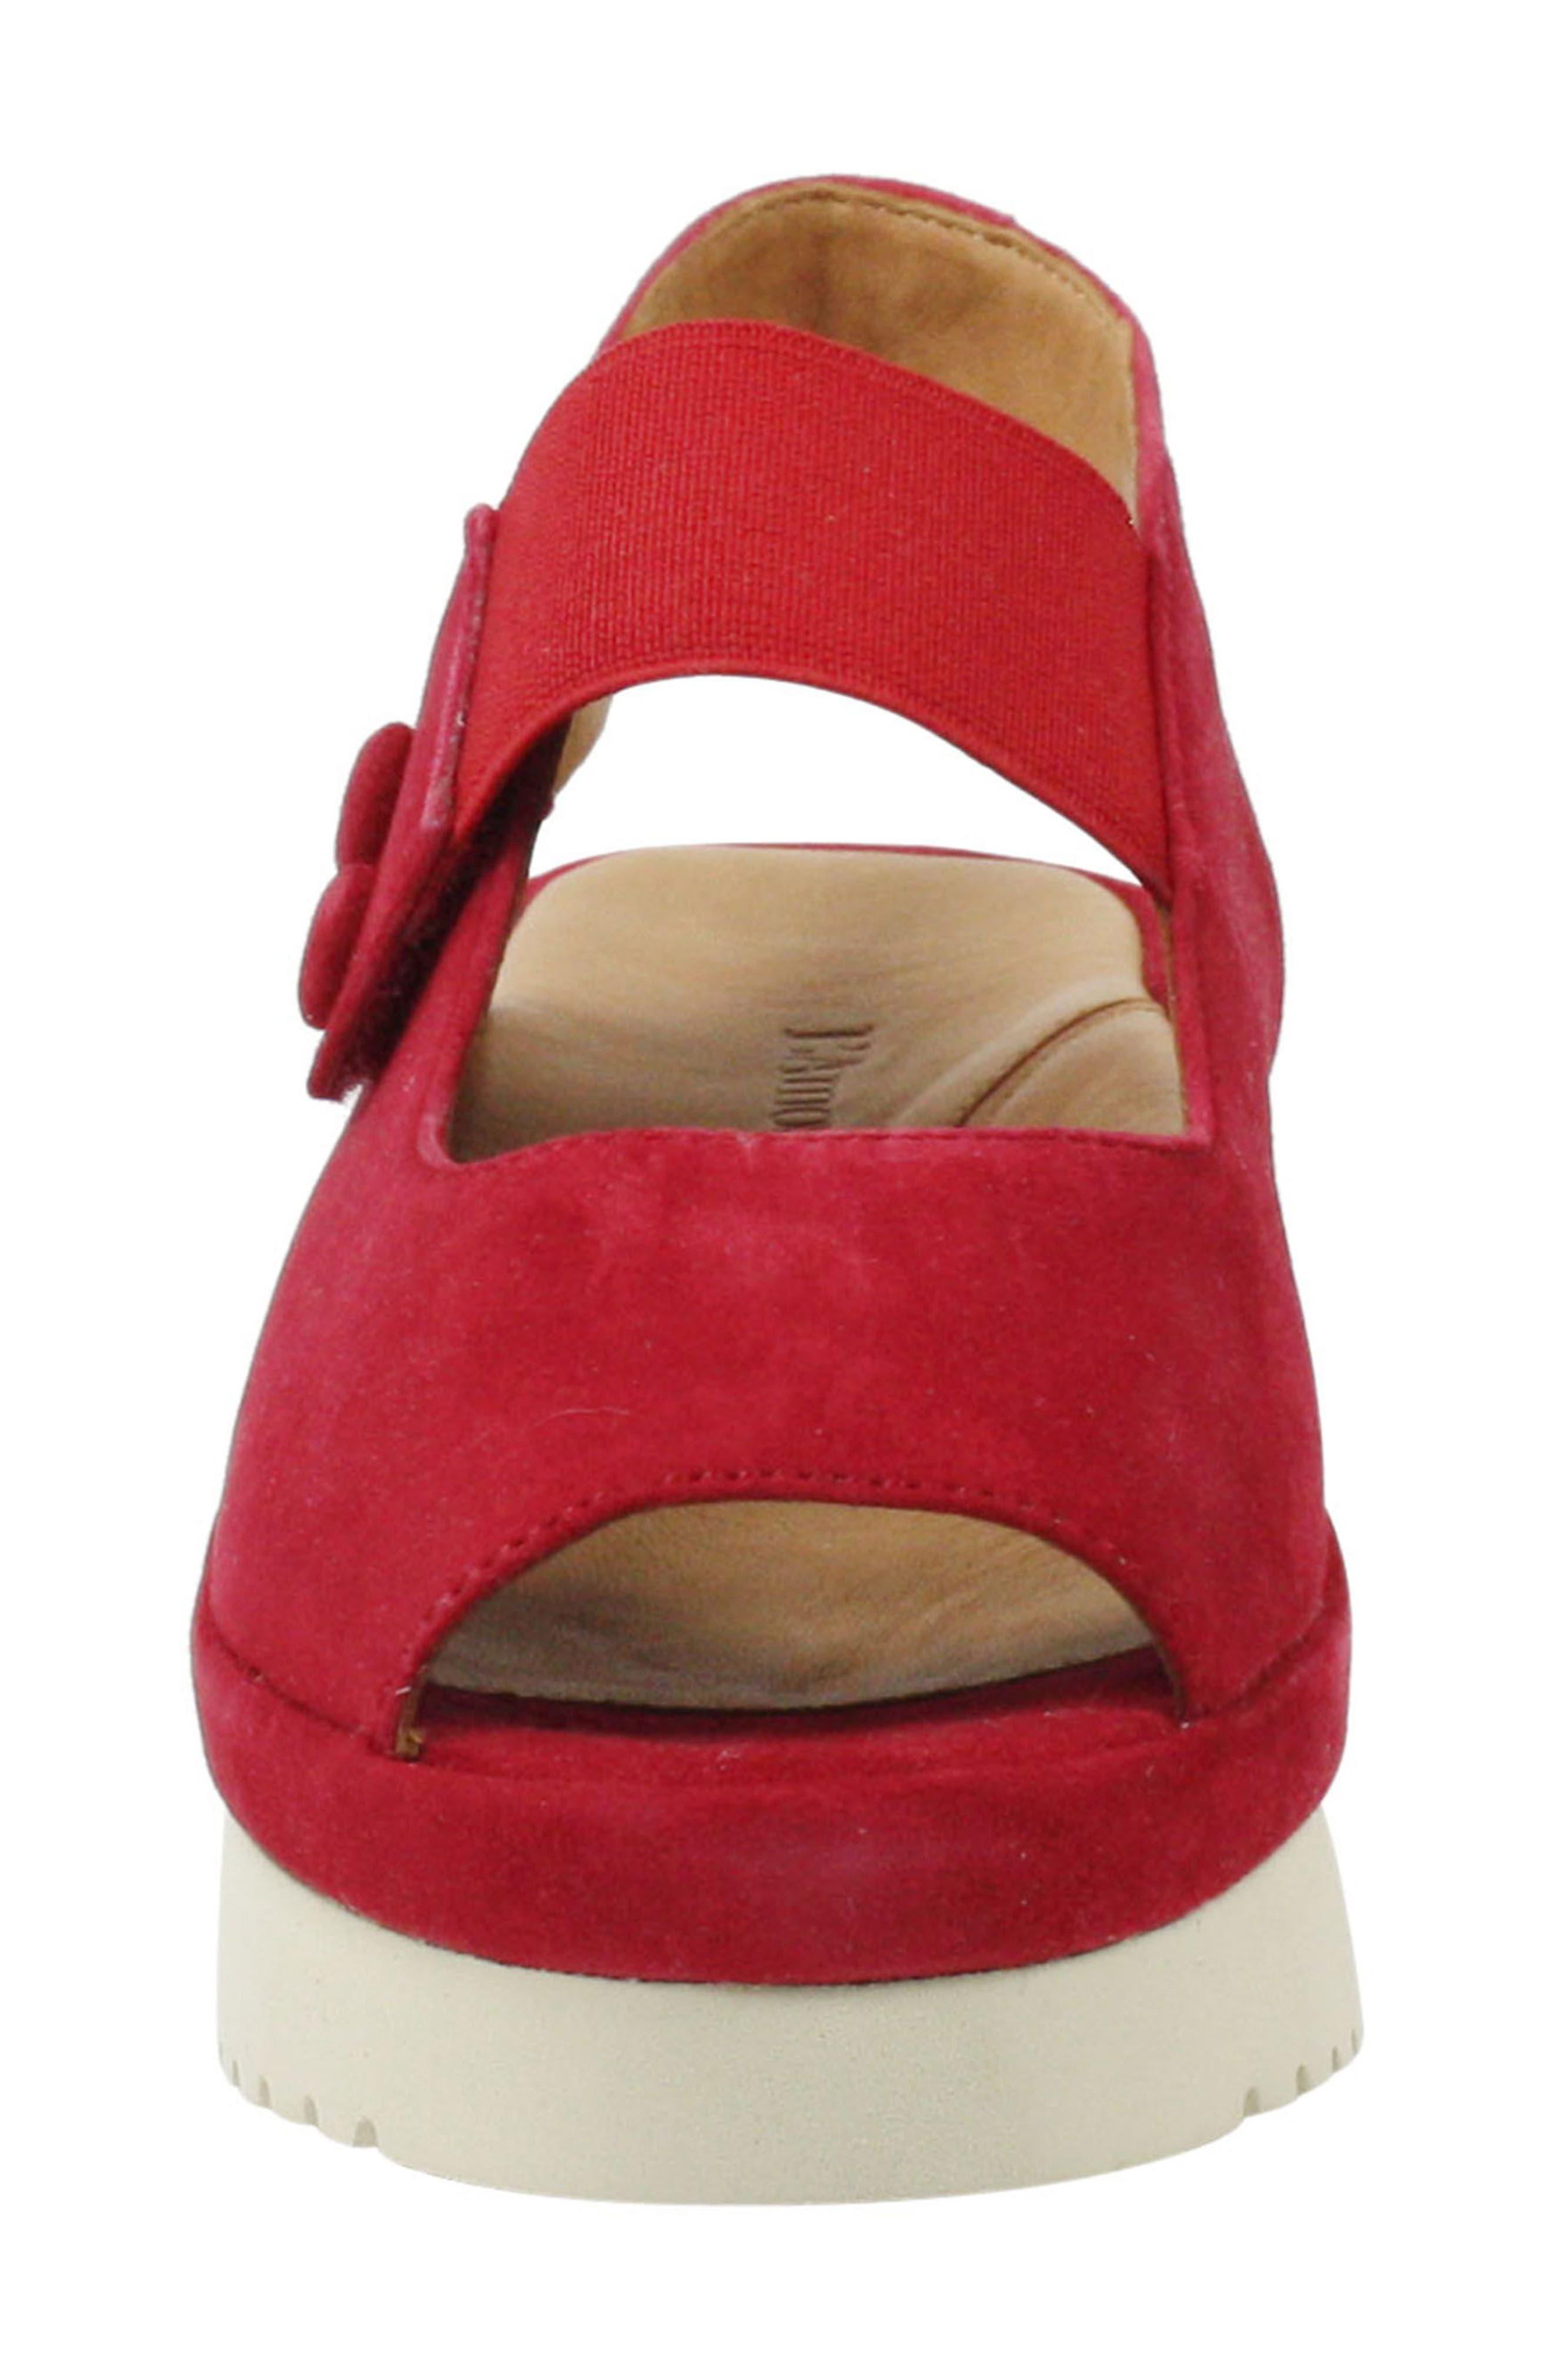 Adalicia Platform Sandal,                             Alternate thumbnail 4, color,                             Bright Red Suede